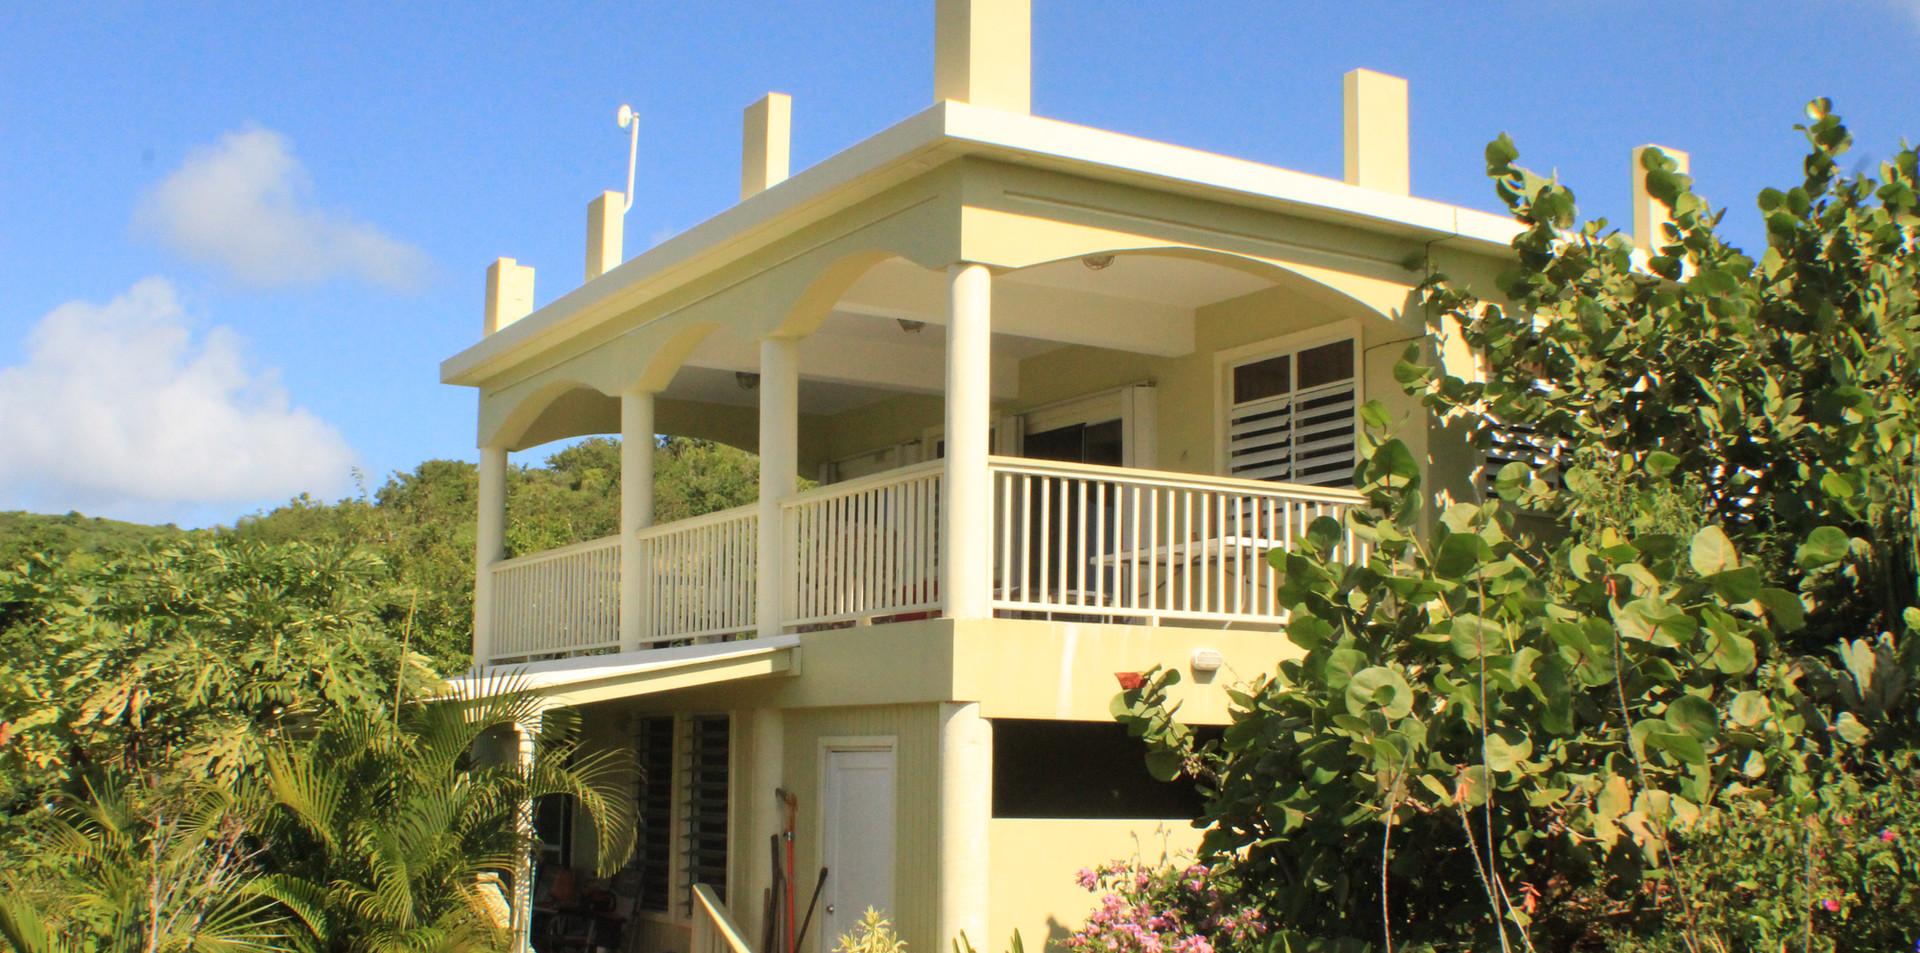 Upper Patio and Lower Studio Porch